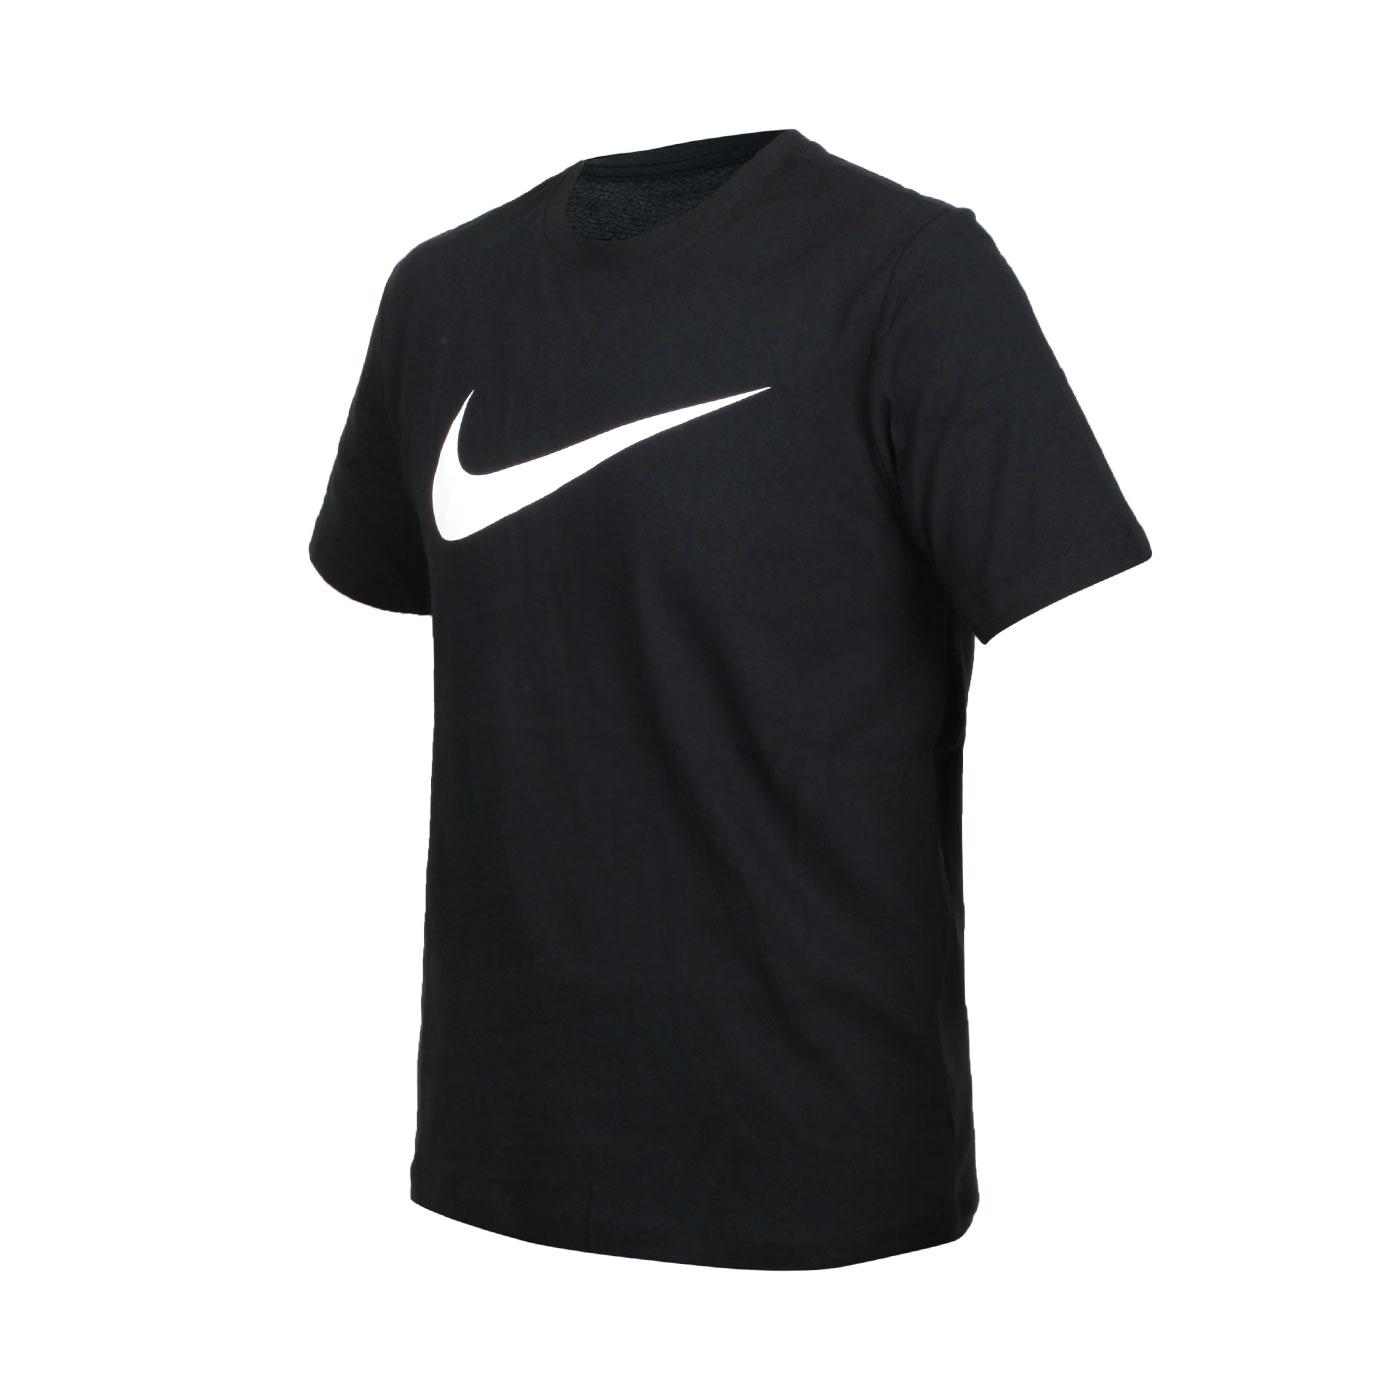 NIKE 男款短袖T恤 DC5095-010